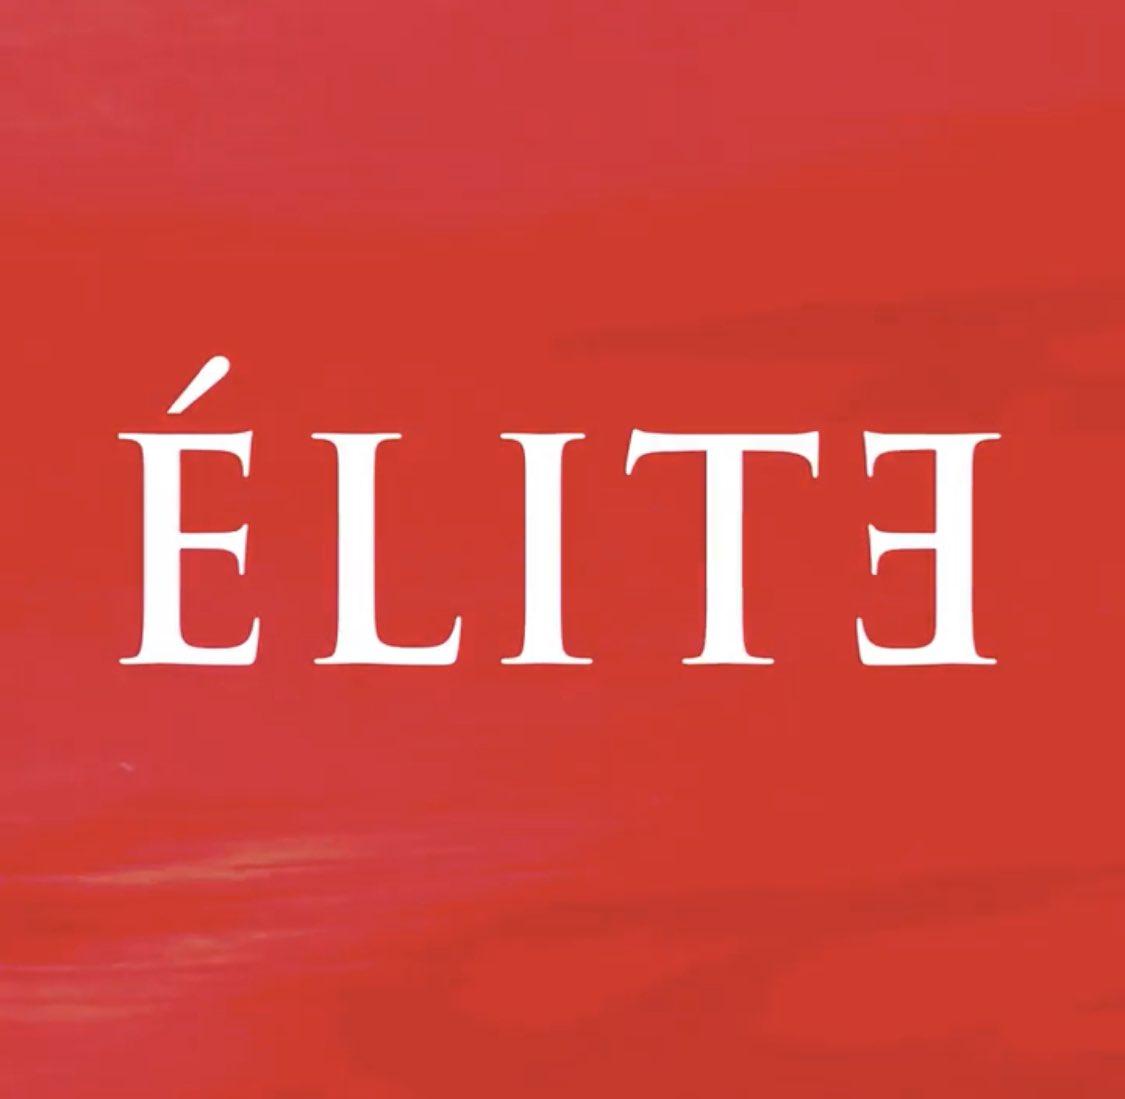 FINALLY ELITE SEASON 3 IS COMING IN MARCH #Elite3<br>http://pic.twitter.com/1eM0b4Lhoa